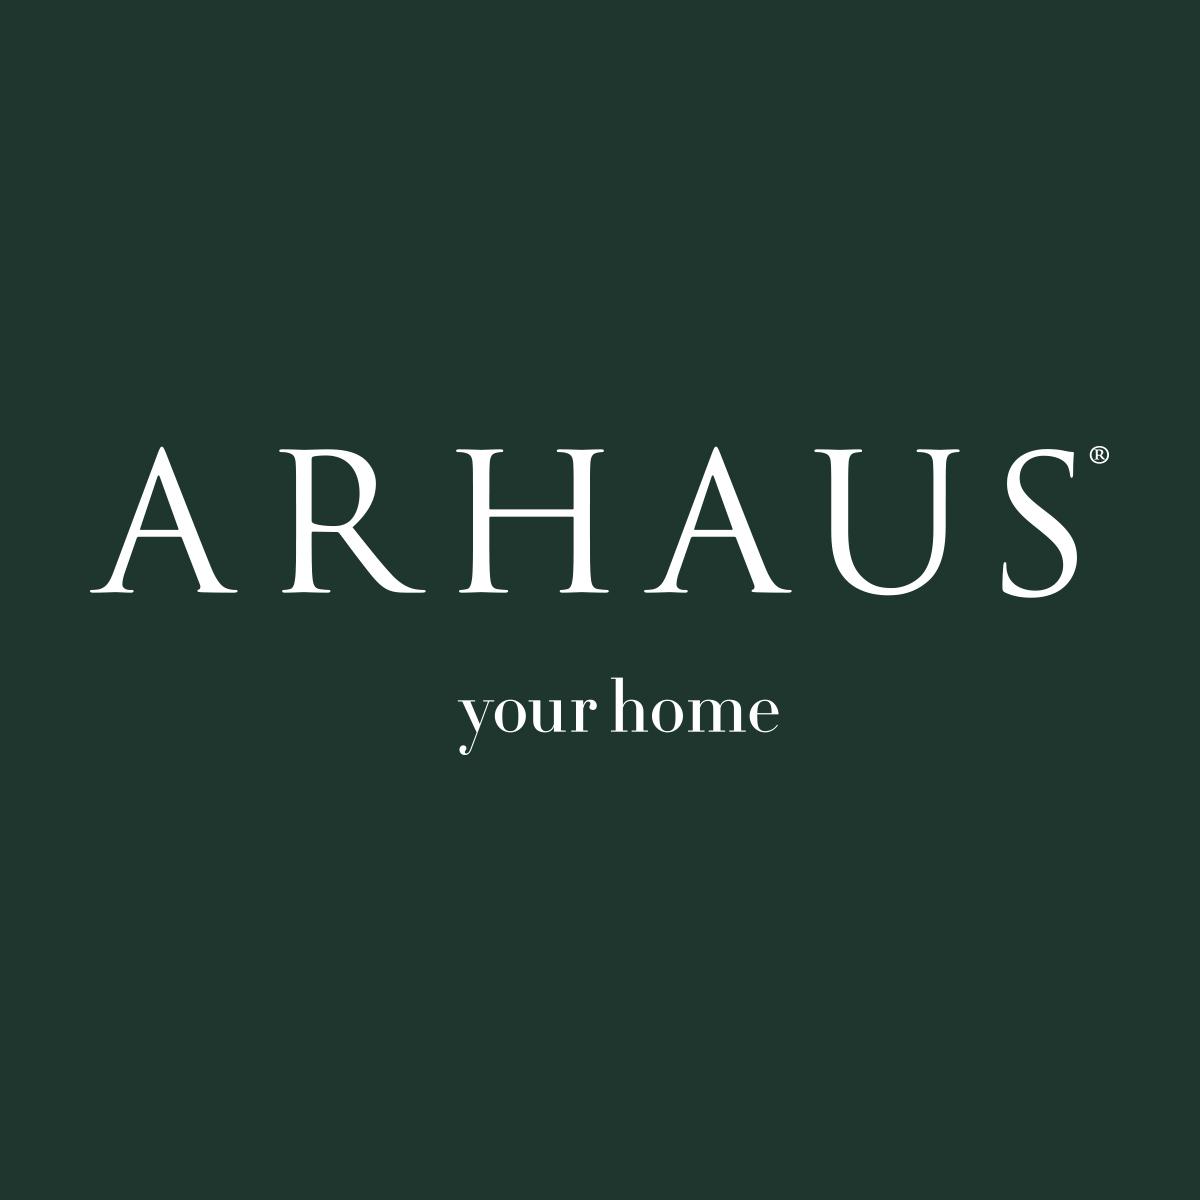 Arhaus Studio